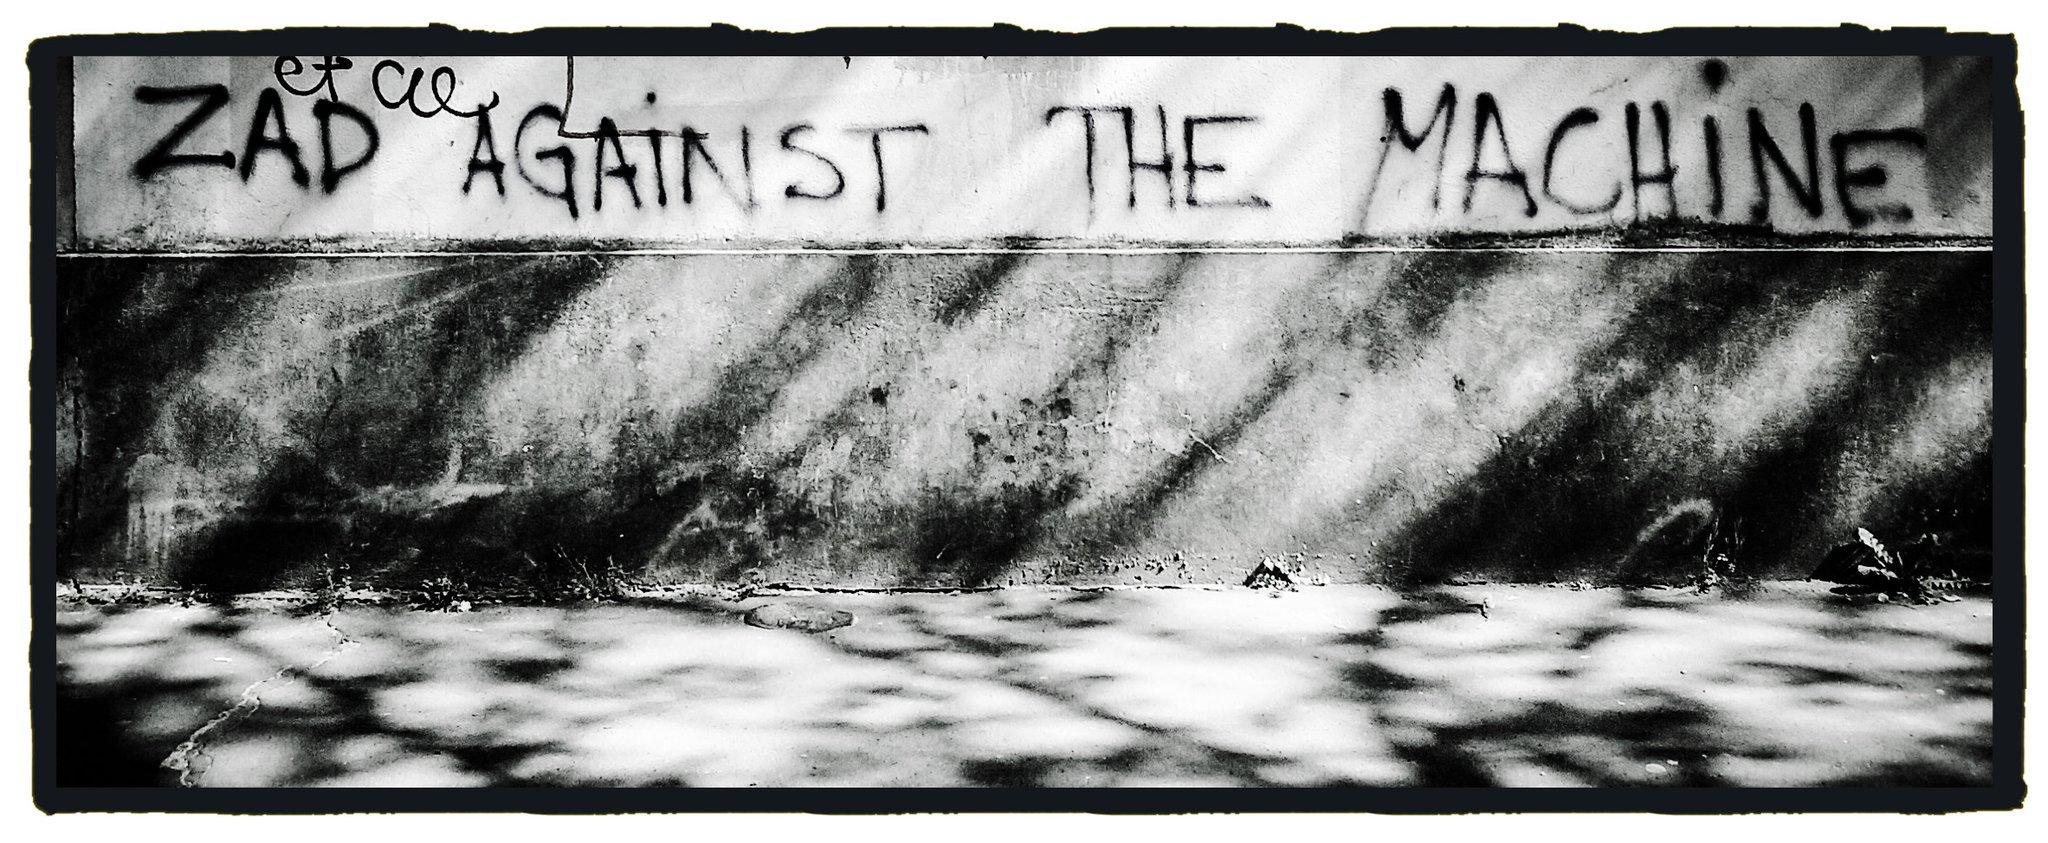 Zad against the machine